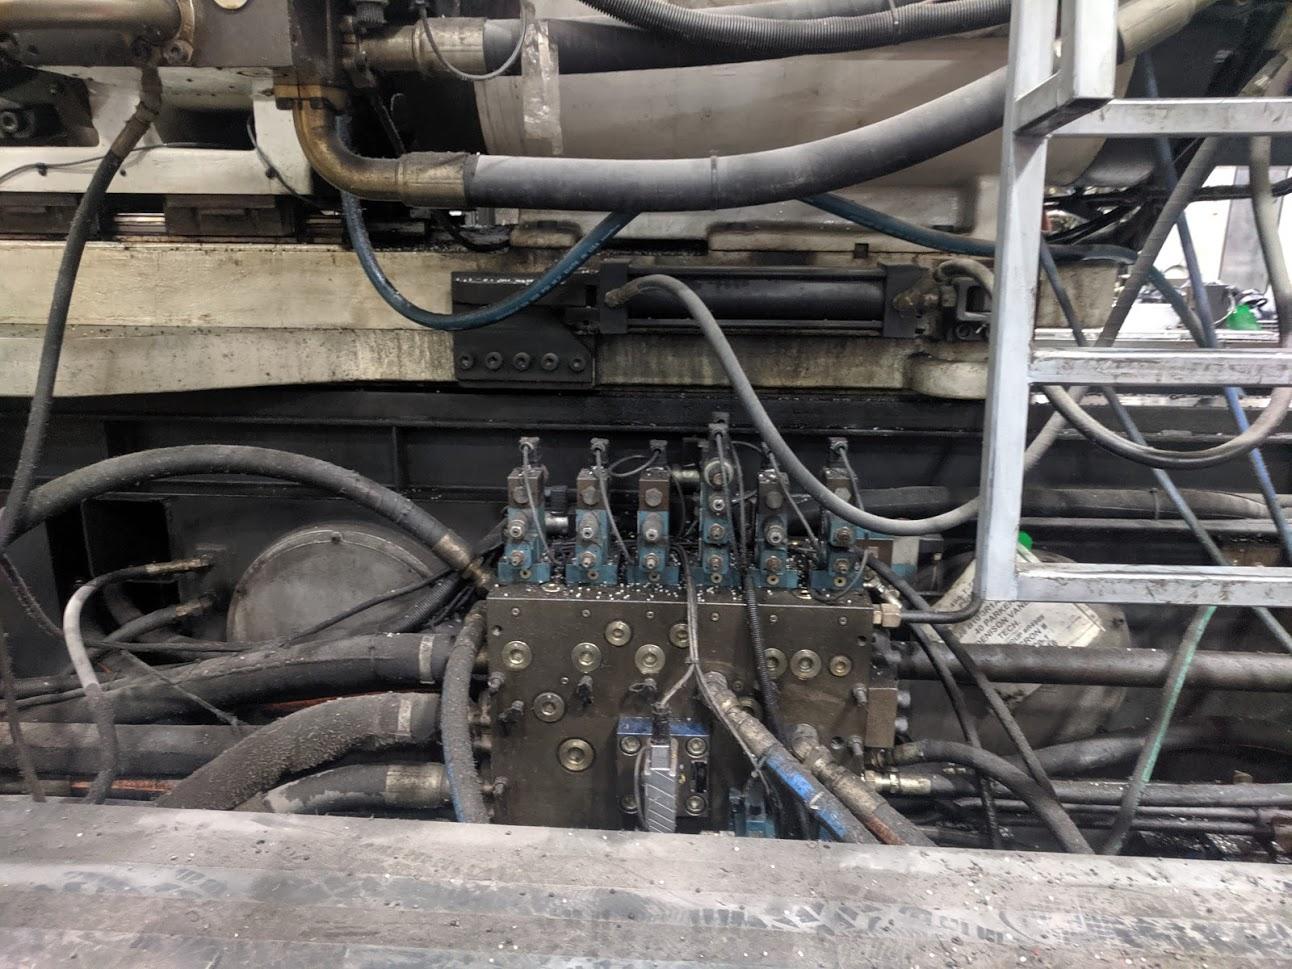 used 2000 cincinnati ml1800-540 injection molding machine for sale